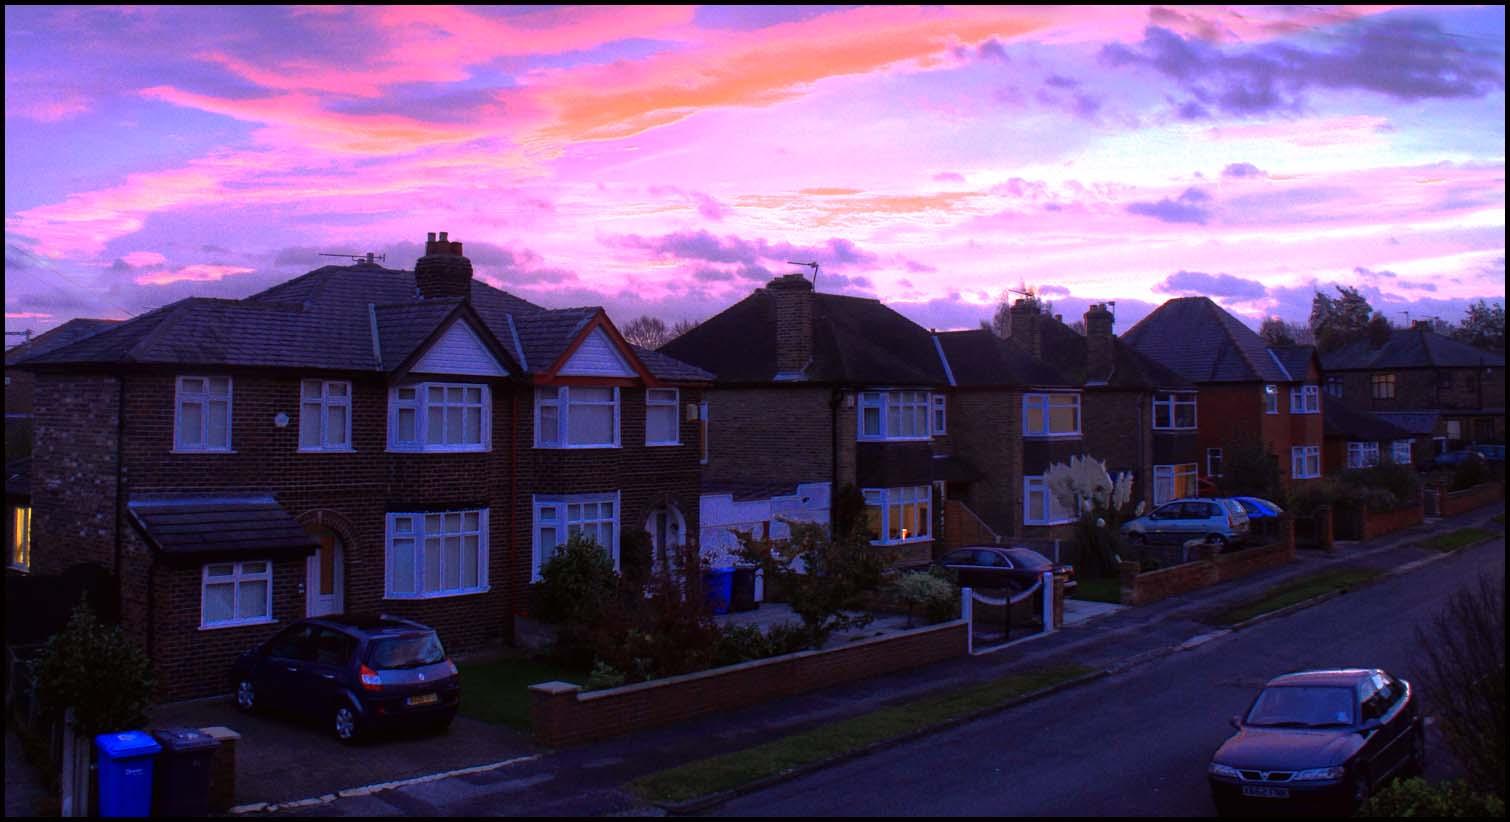 red,sky,morning,grappenhall,village,england,UK,semidetached,house,houses,semi,detached,street,car,blue,purple,lindi,avenue,lindiavenue,7,7lindi,7lindiavenue,365days,HDR,high dynamic range,tonysmith,tony,smith,Hotpicks,hotpics,hot,pics,pix,picks,hotpix.freeserve.co.uk,noche,nuit,hotpix!,hotpix.rocketmail.com,hotpixuk.rocketmail.com,contact.tony.smith.gmail.com,tony.smith.gmail.com,tonys@miscs.com,tony.smith@mis-ams.com